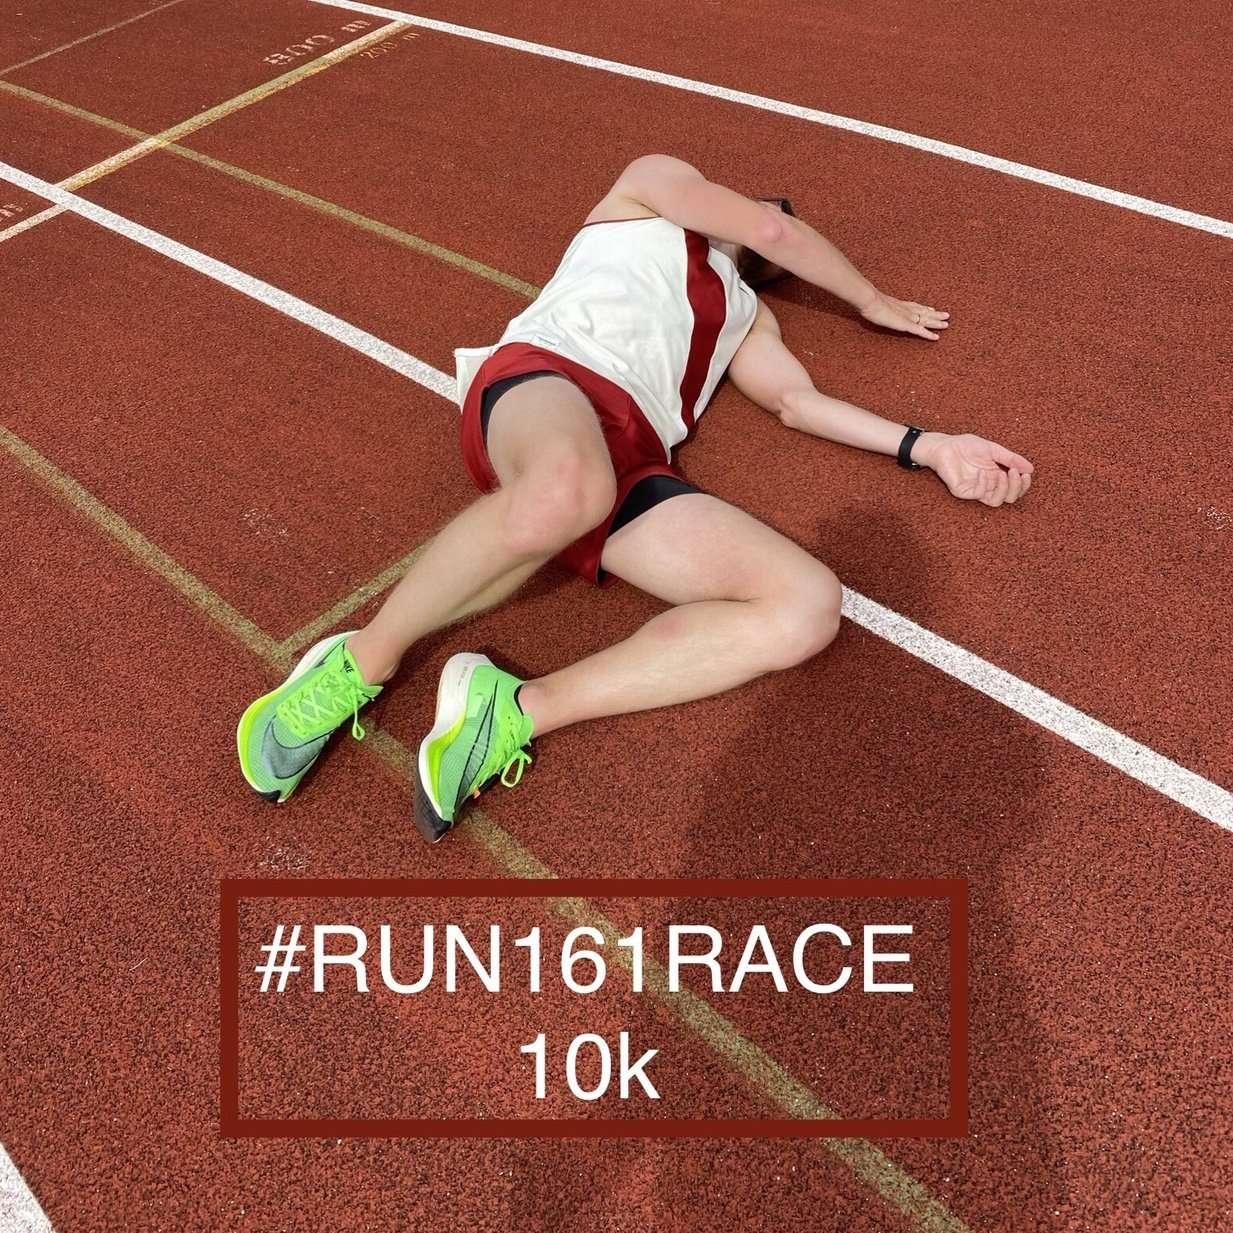 #Run161Race 10k results